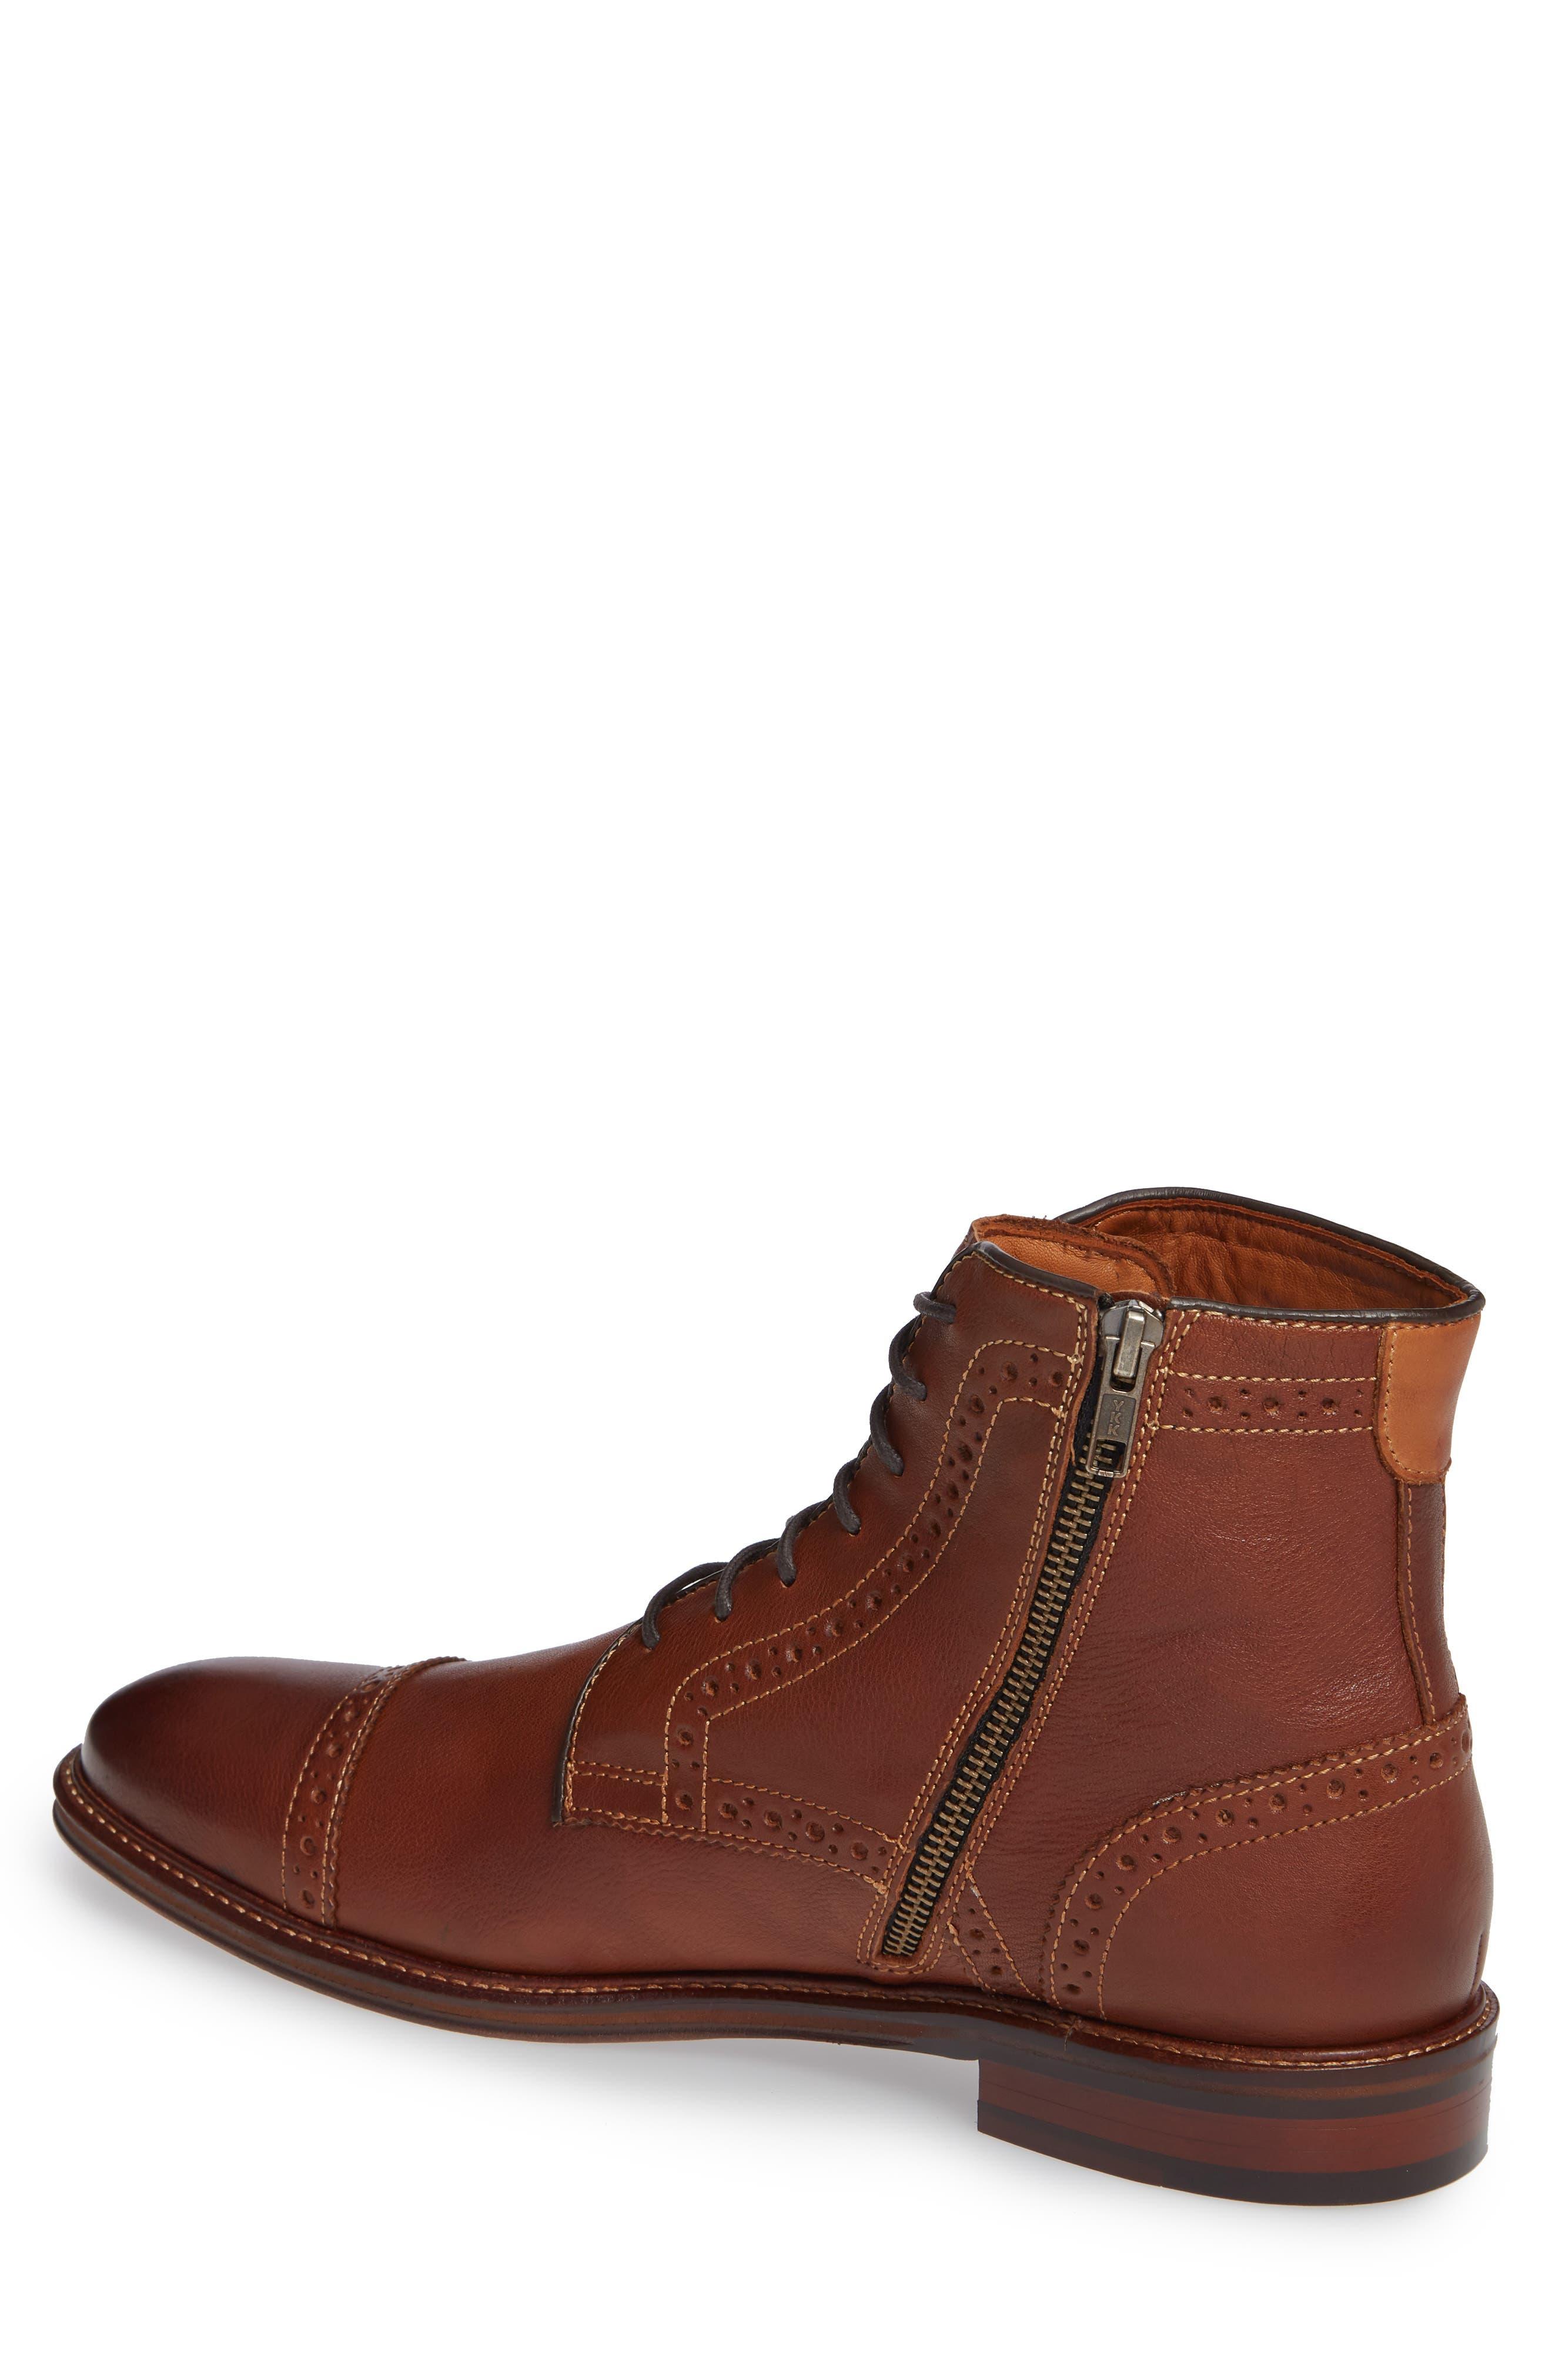 johnston and murphy warner boot